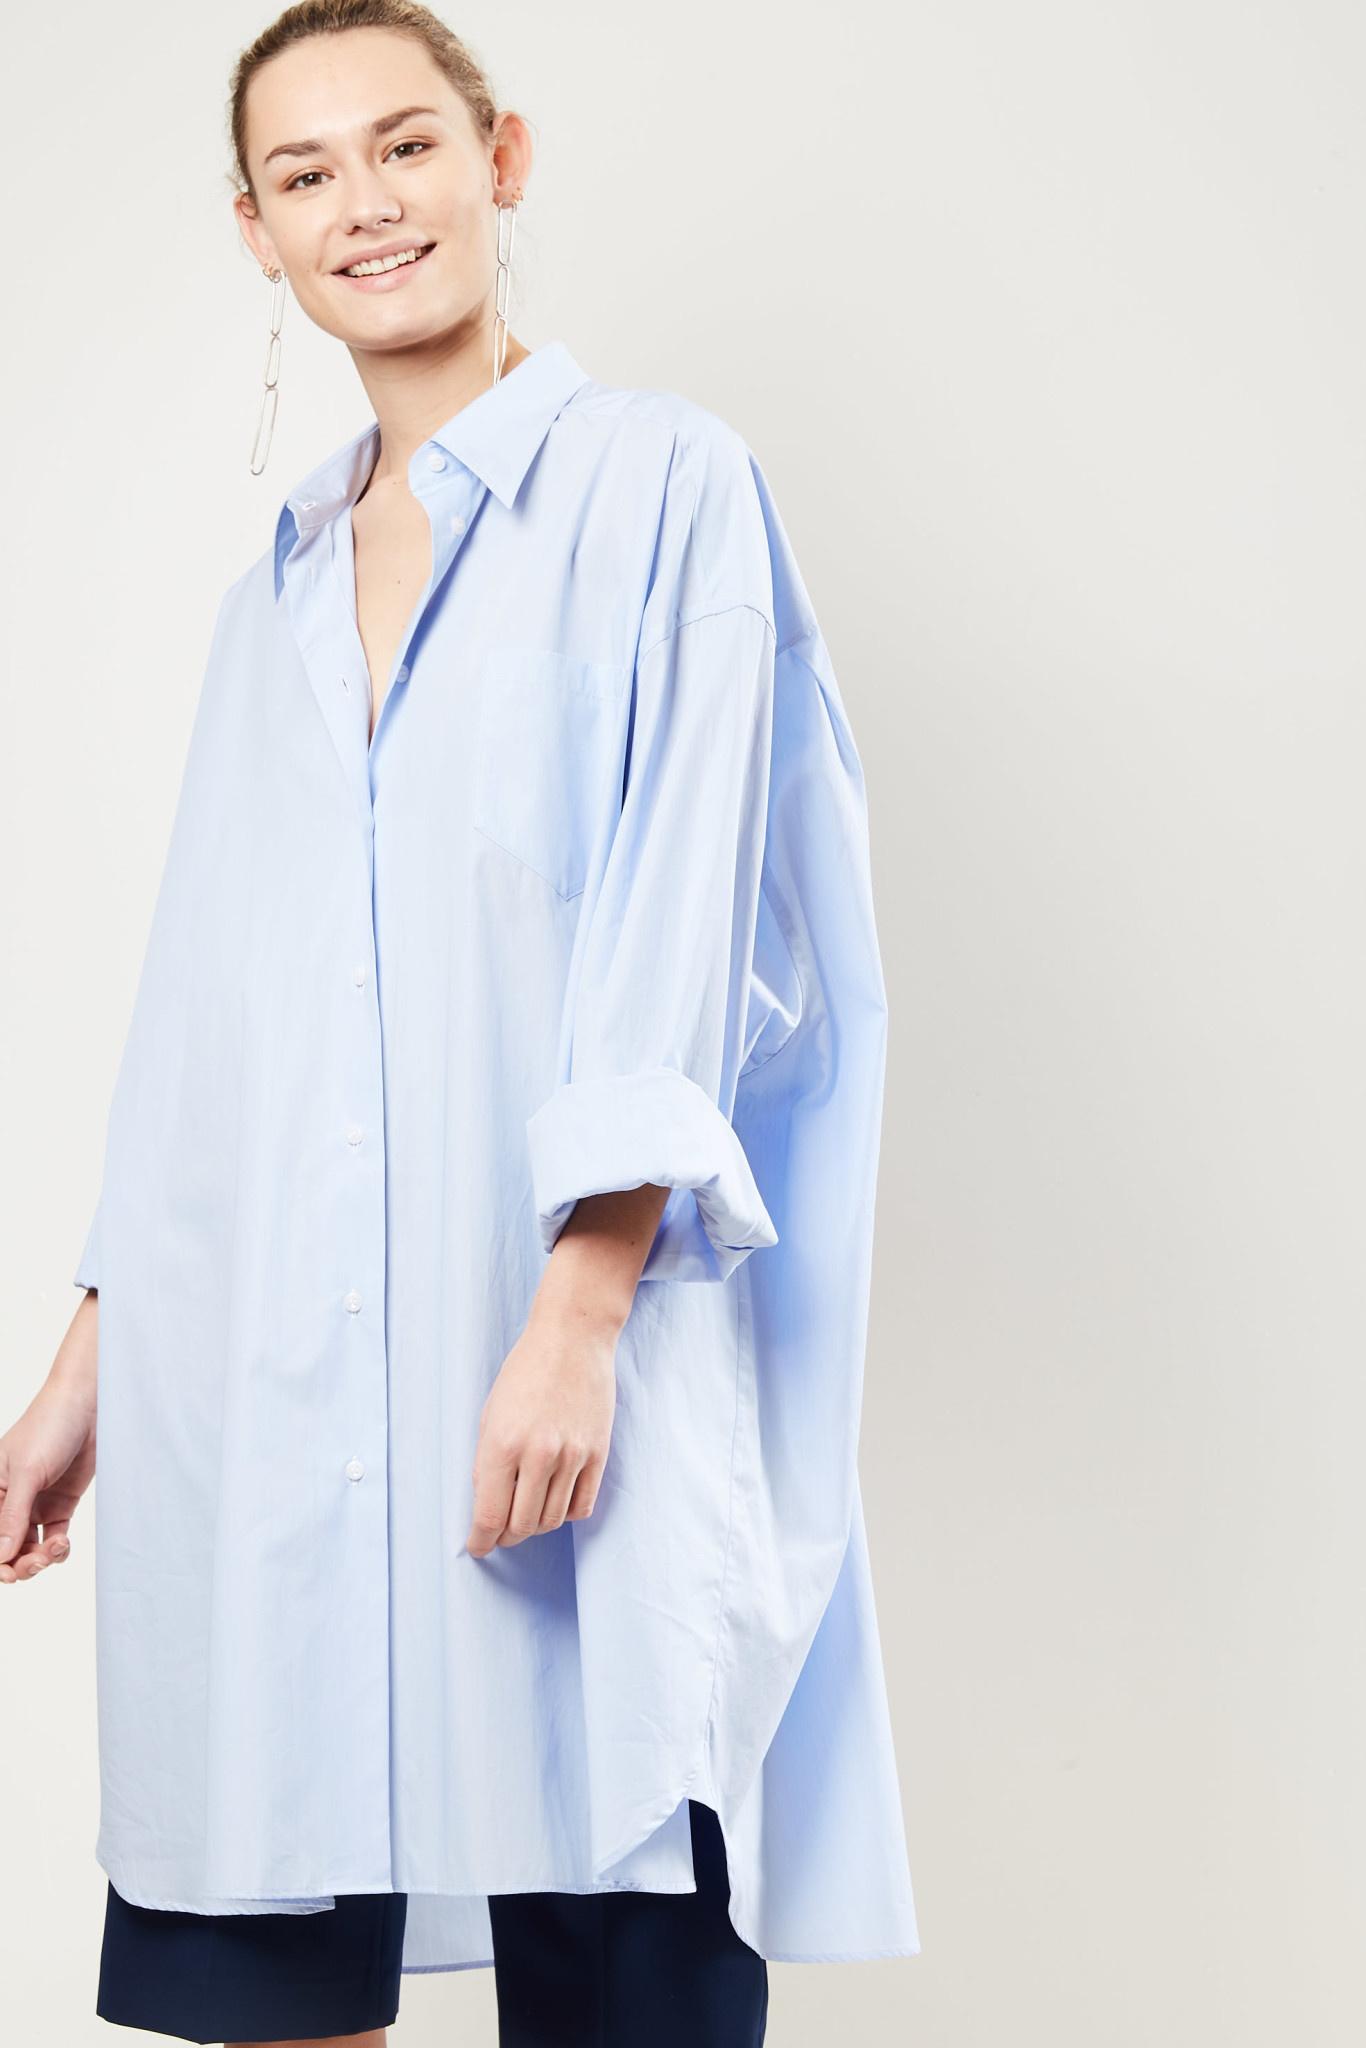 Maison Margiela Asymmetric longline shirt.